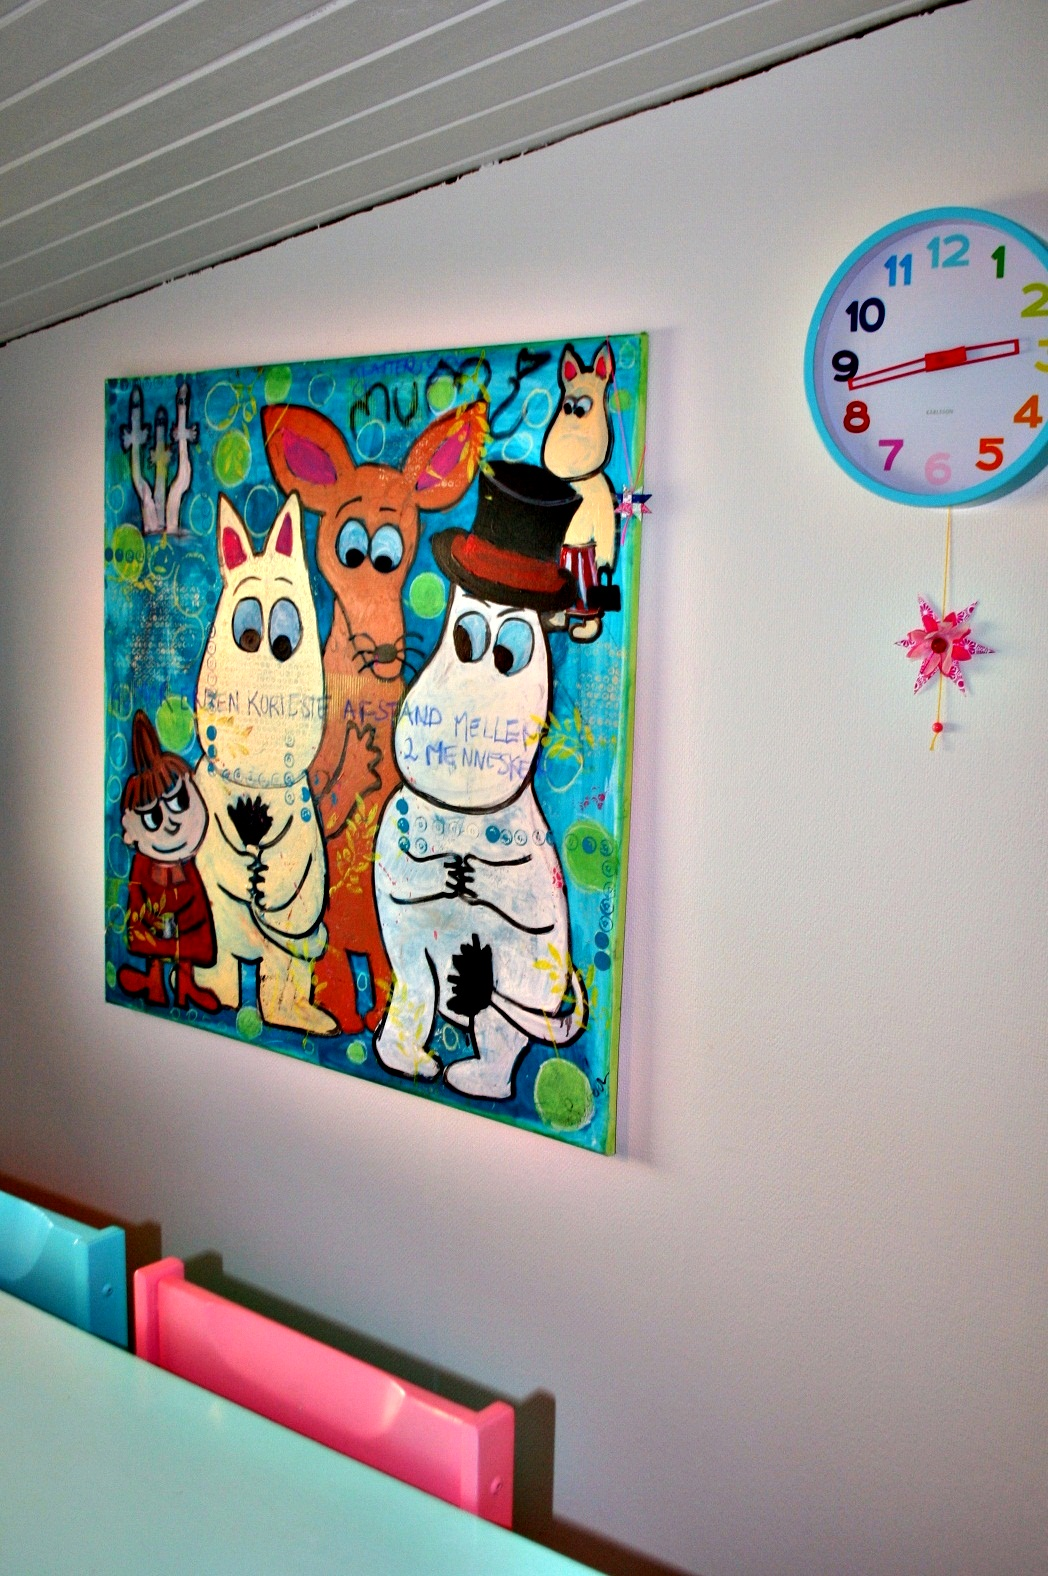 KrudtuglensMor: Malerierne i huset!